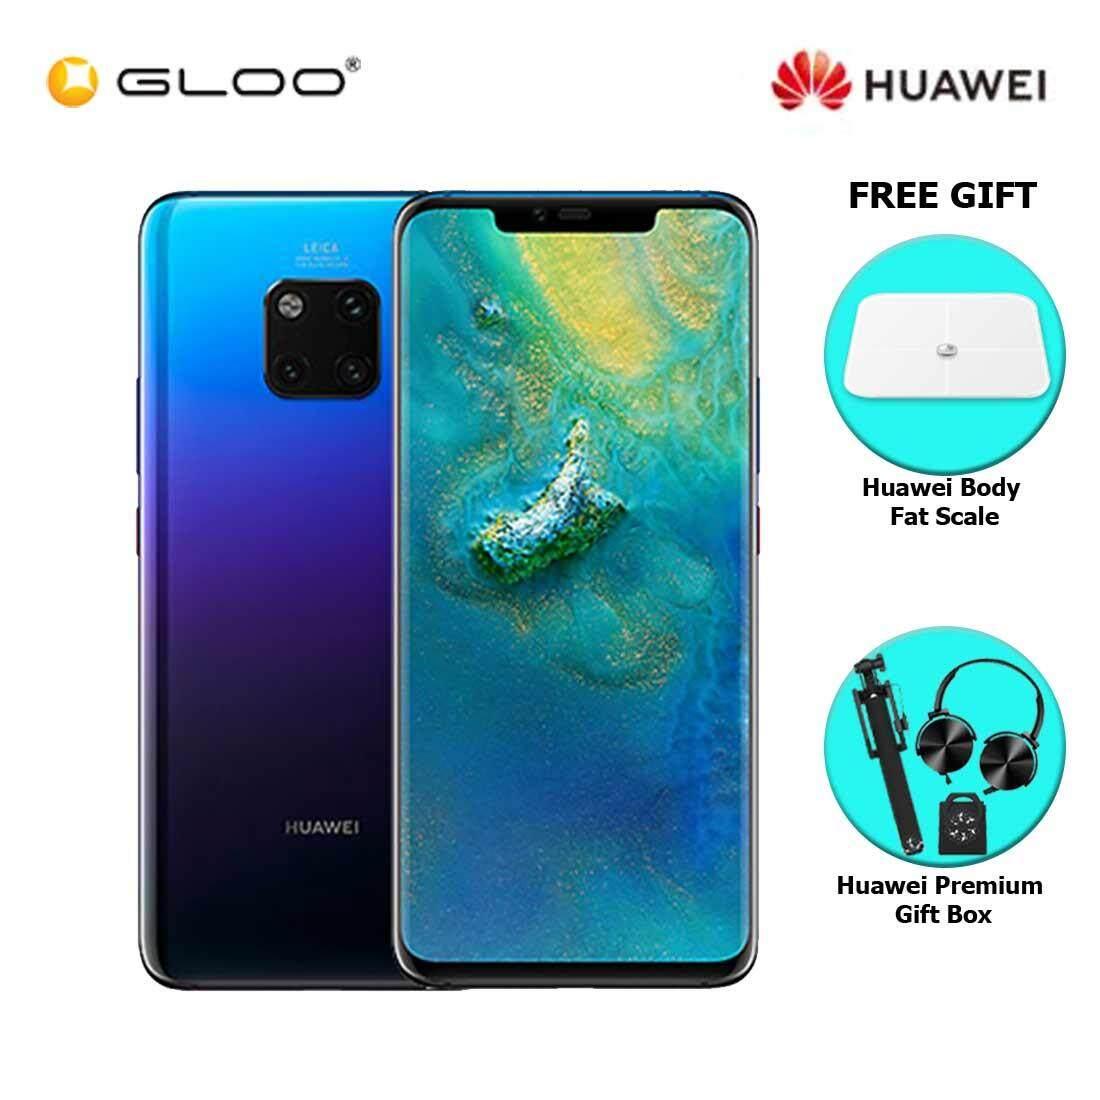 Huawei Mate 20 Pro 6GB+128GB Twilight + FREE Huawei Body Fat Scale 6901443198375,Premium Gift Box (Headset/Selfie Stick/iRing)